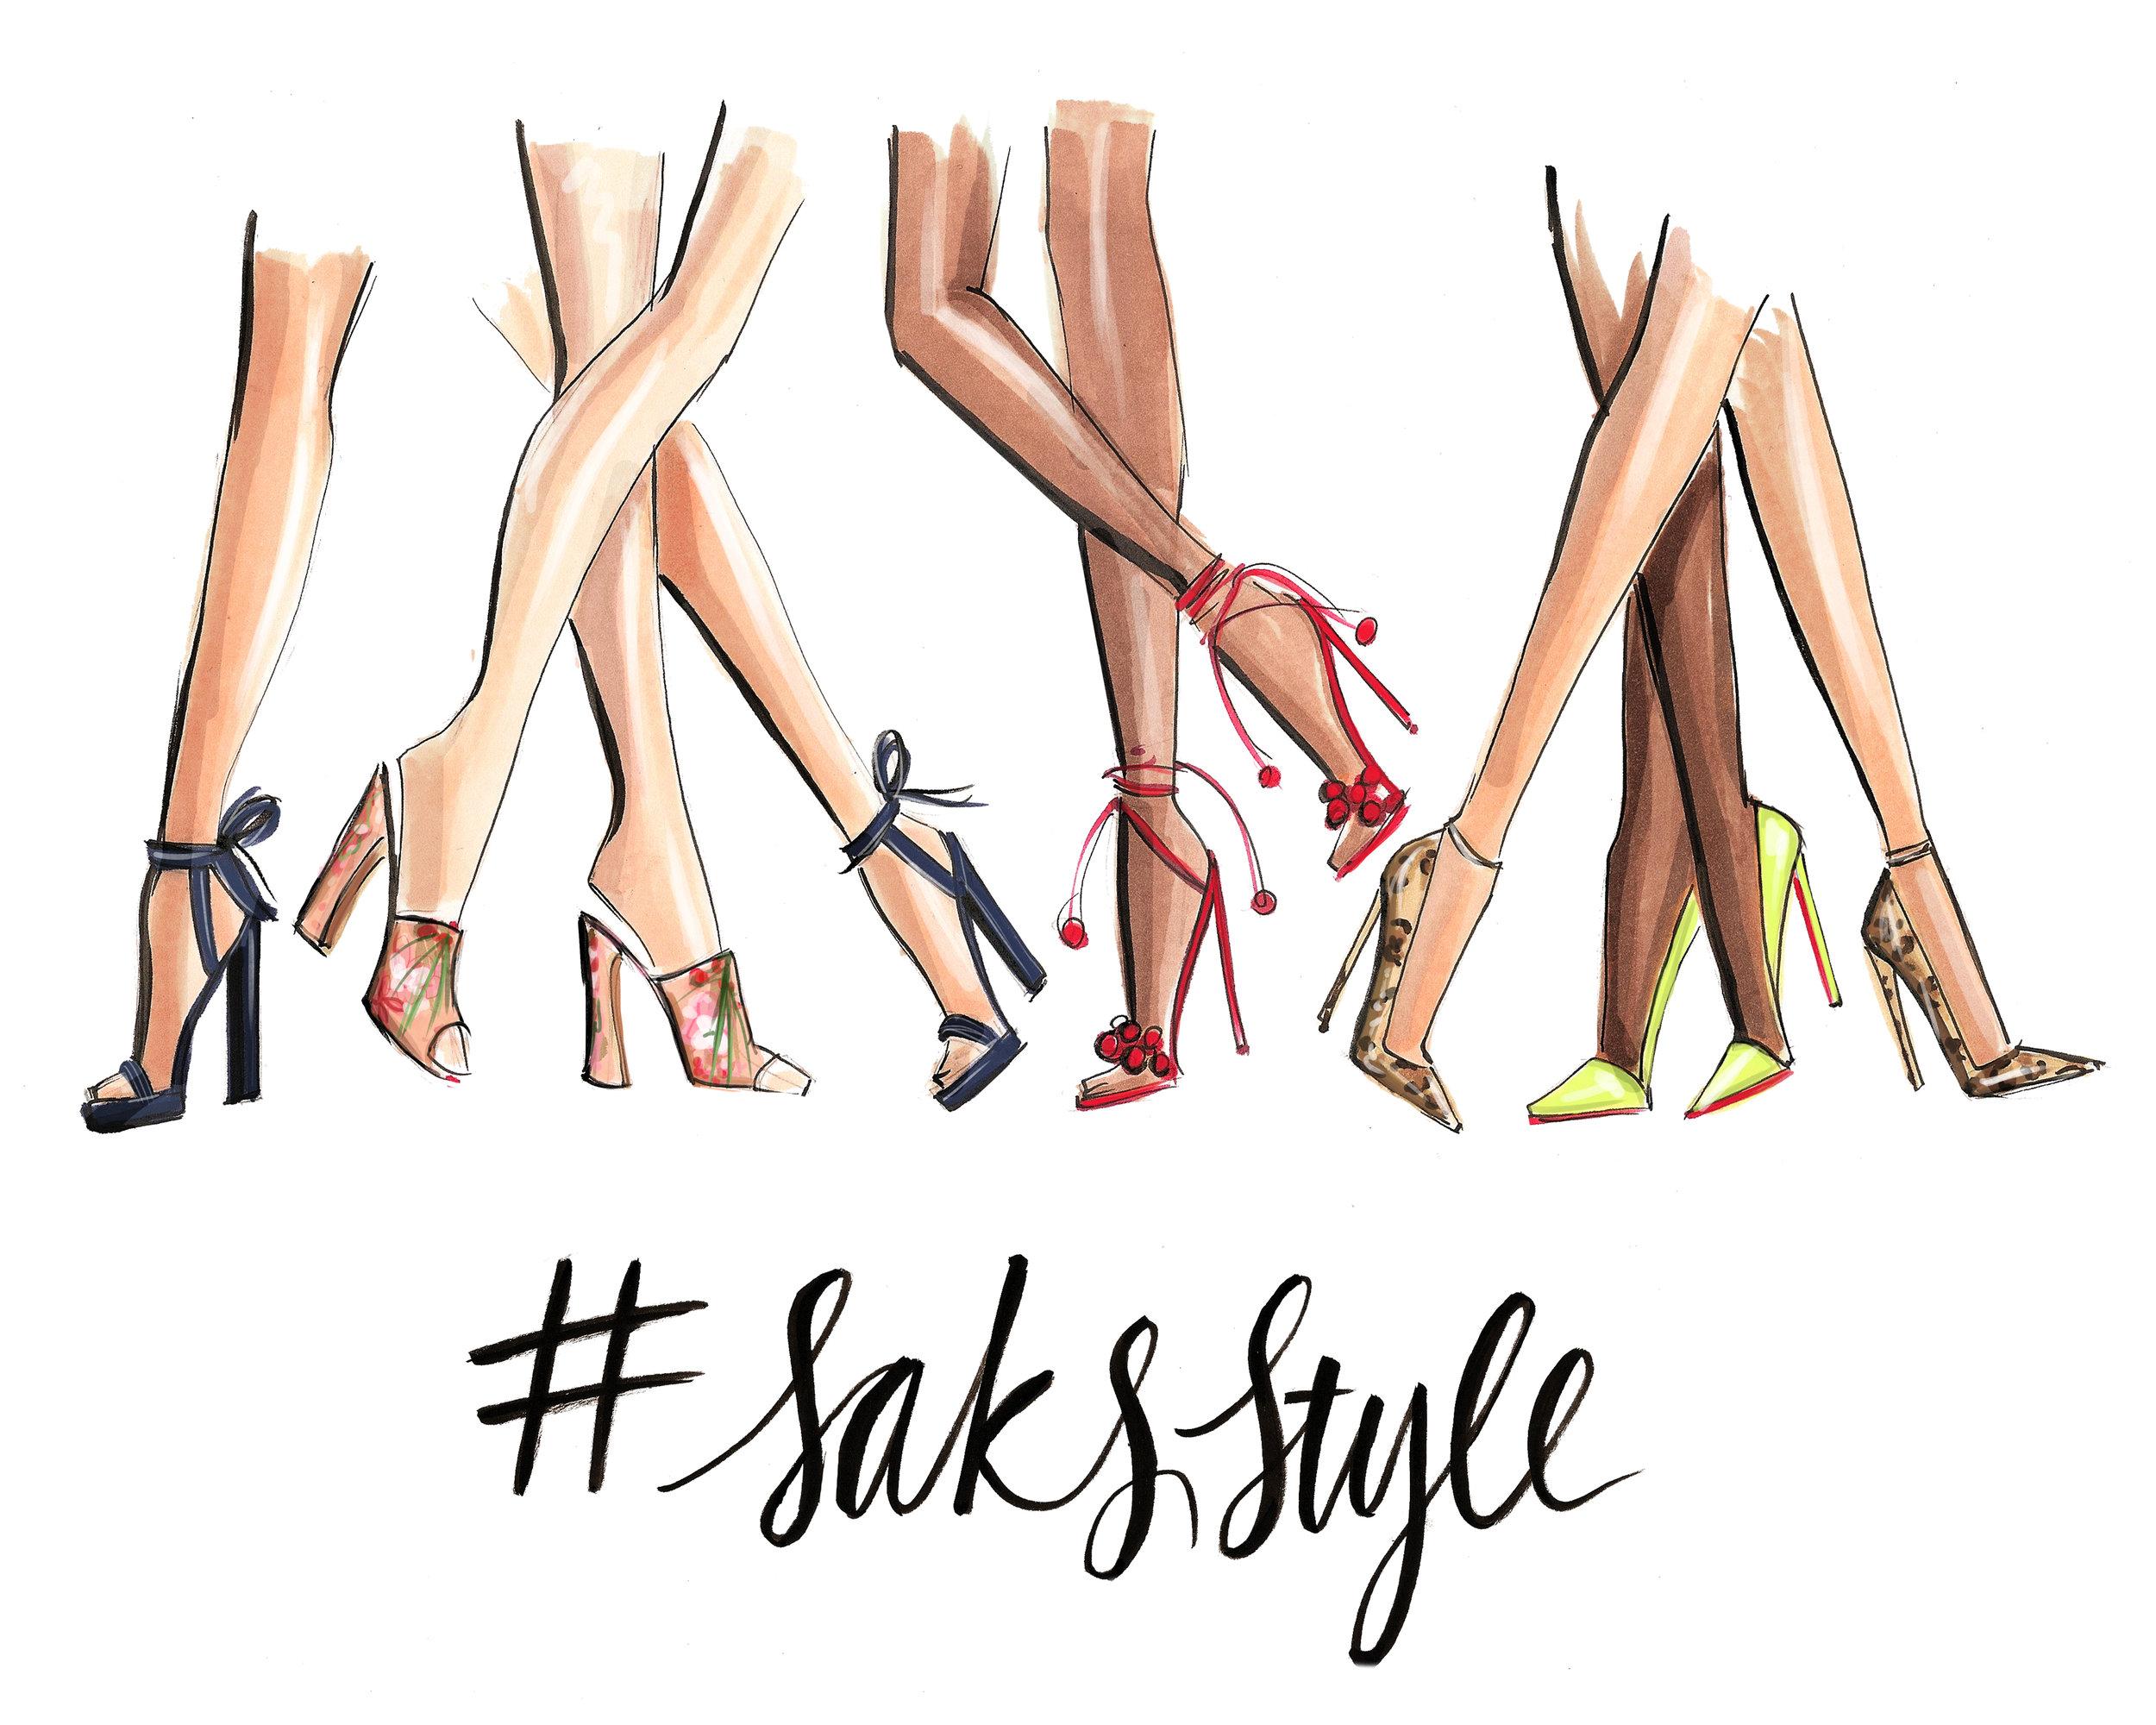 Saks style 1.jpg